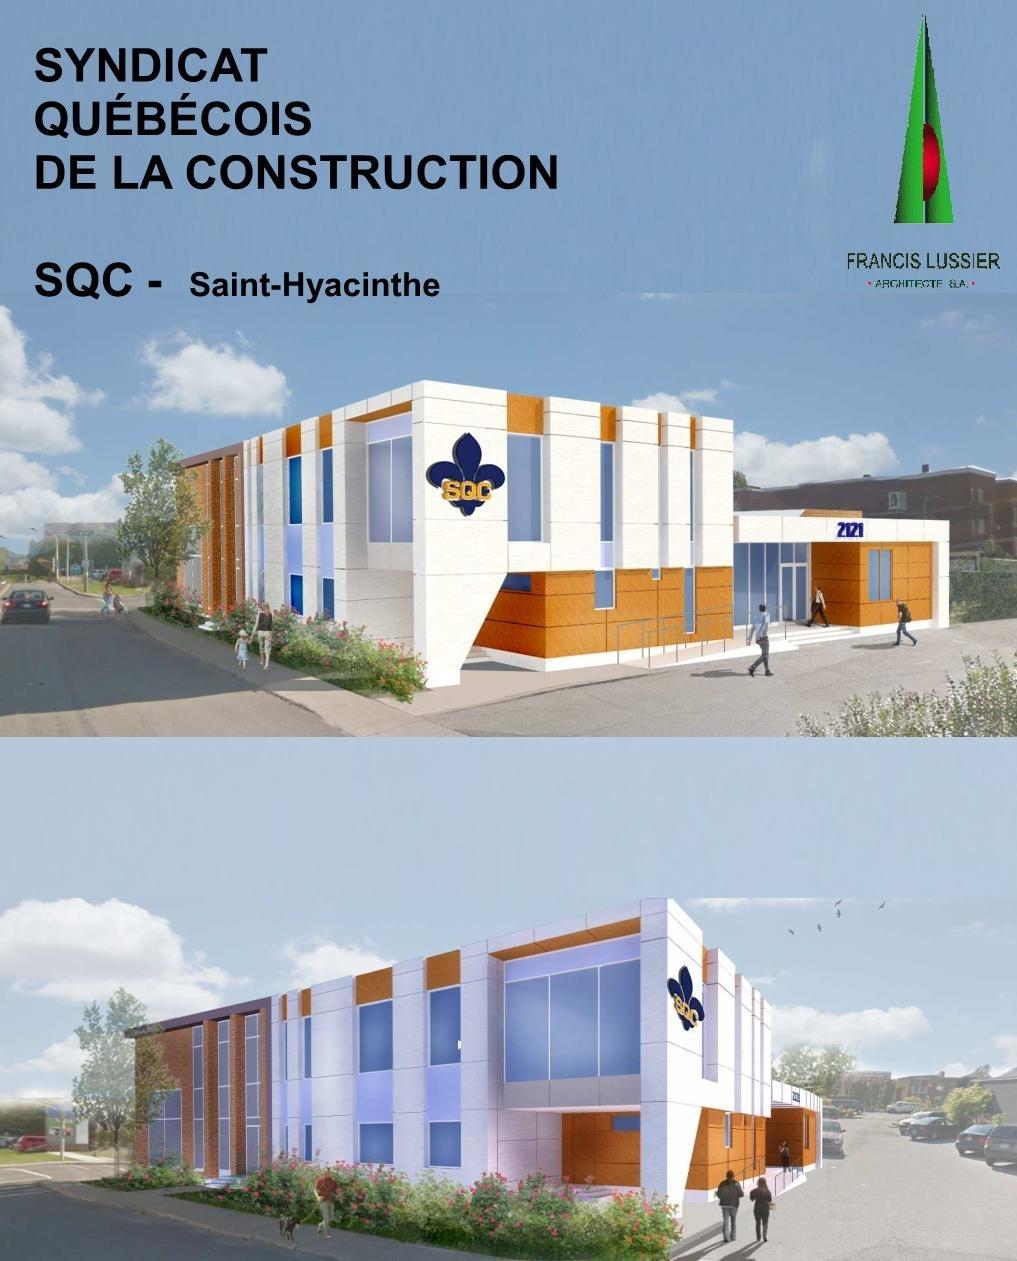 Francis Lussier Architecte in Saint-Hyacinthe